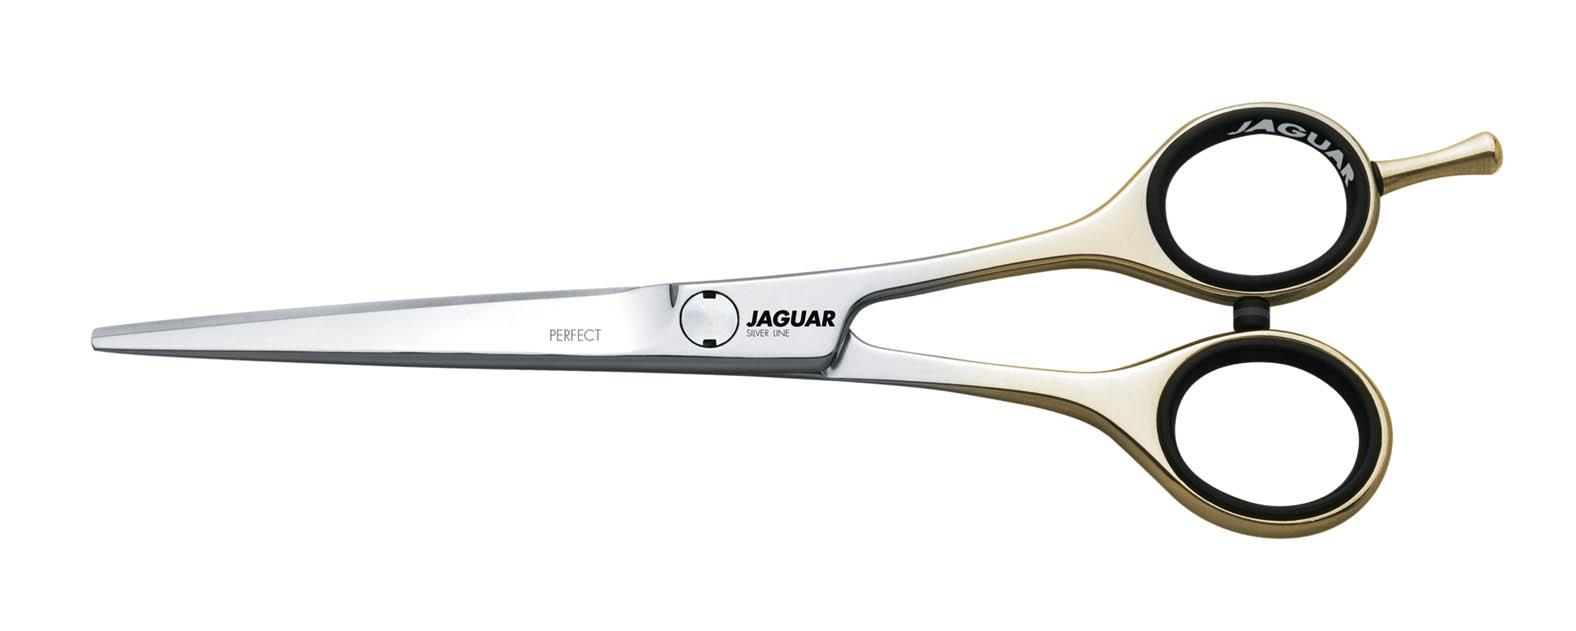 JAGUAR Ножницы Jaguar Perfect 5.5' (14cm) SL